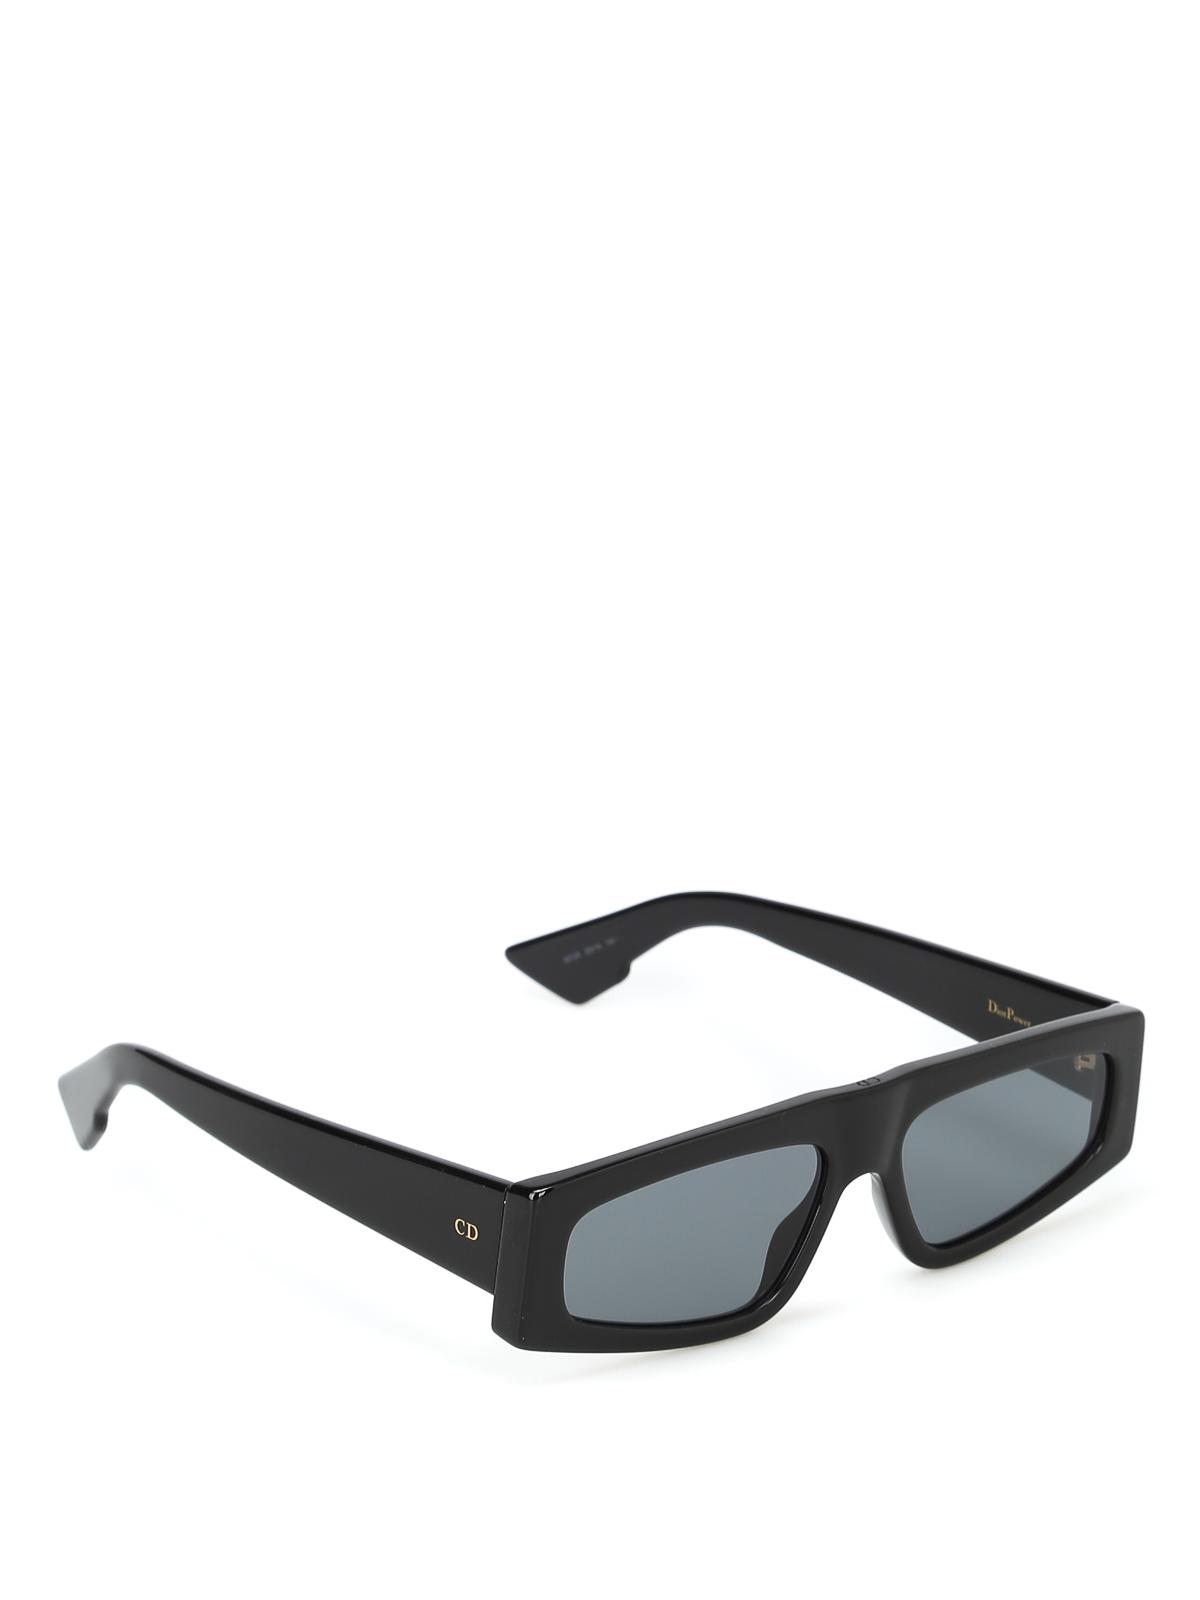 3fd748492389 Dior - DiorPower sunglasses - sunglasses - DIORPOWER8072K